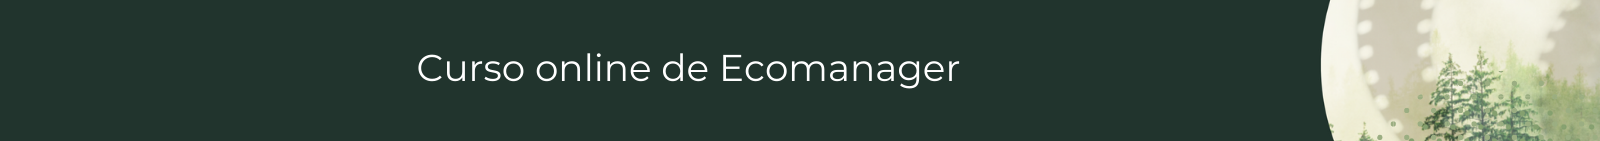 Curso online de ecomanager